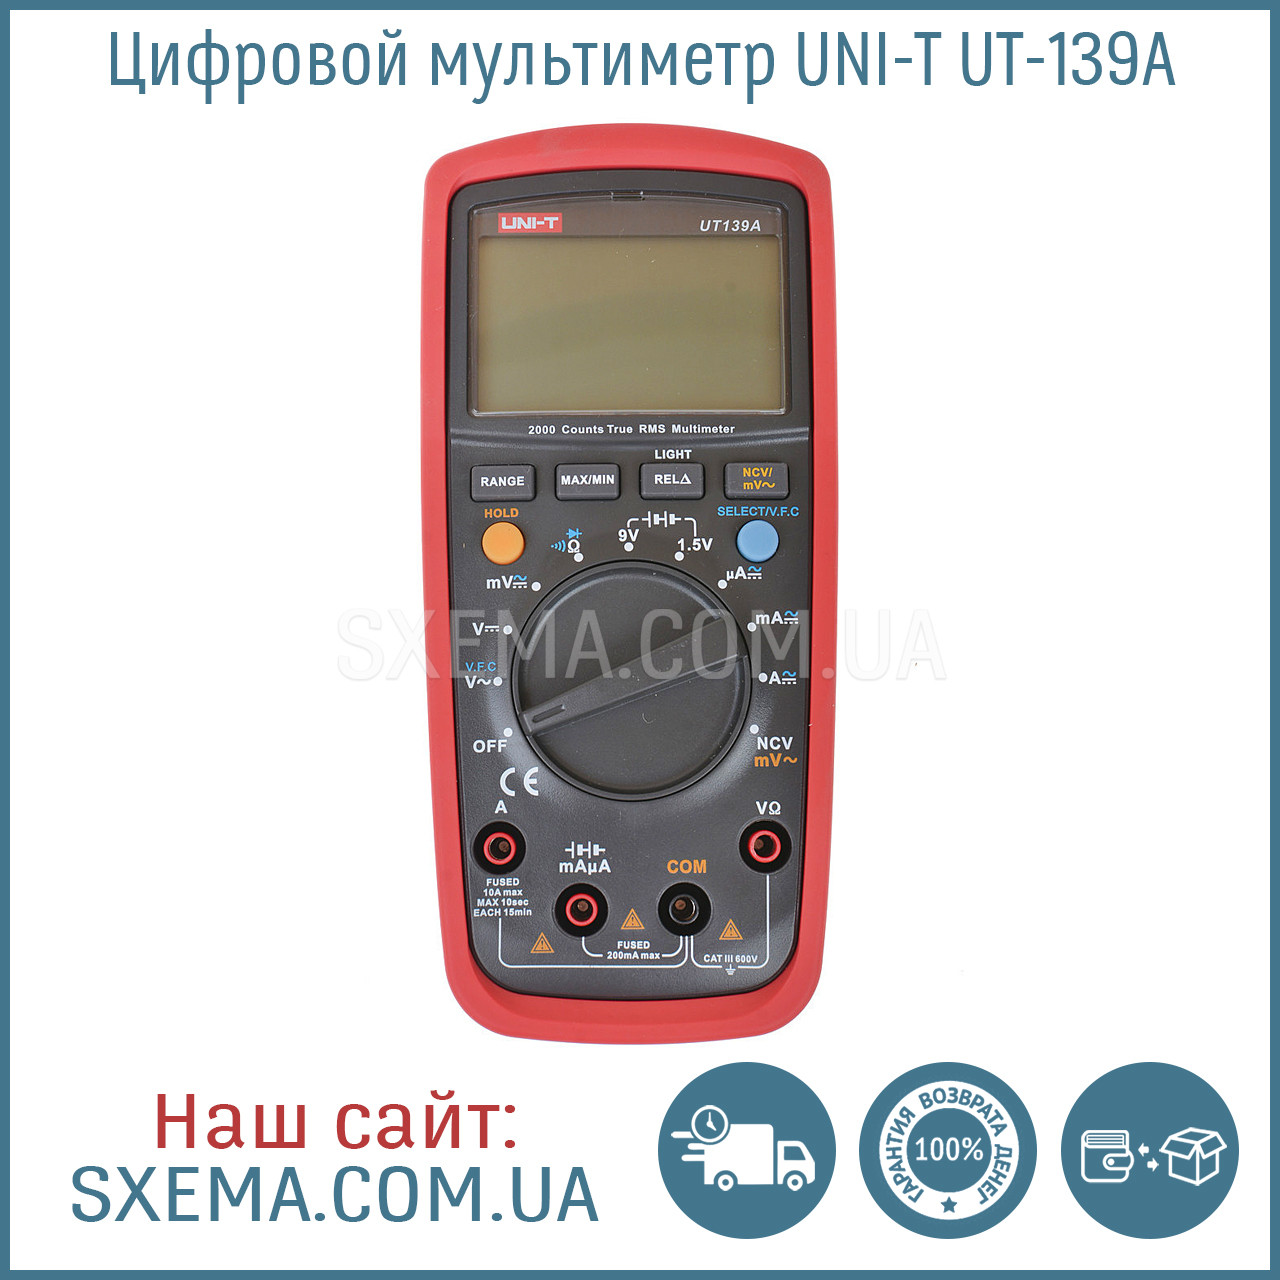 Цифровой мультиметр UNI-T UT-139A